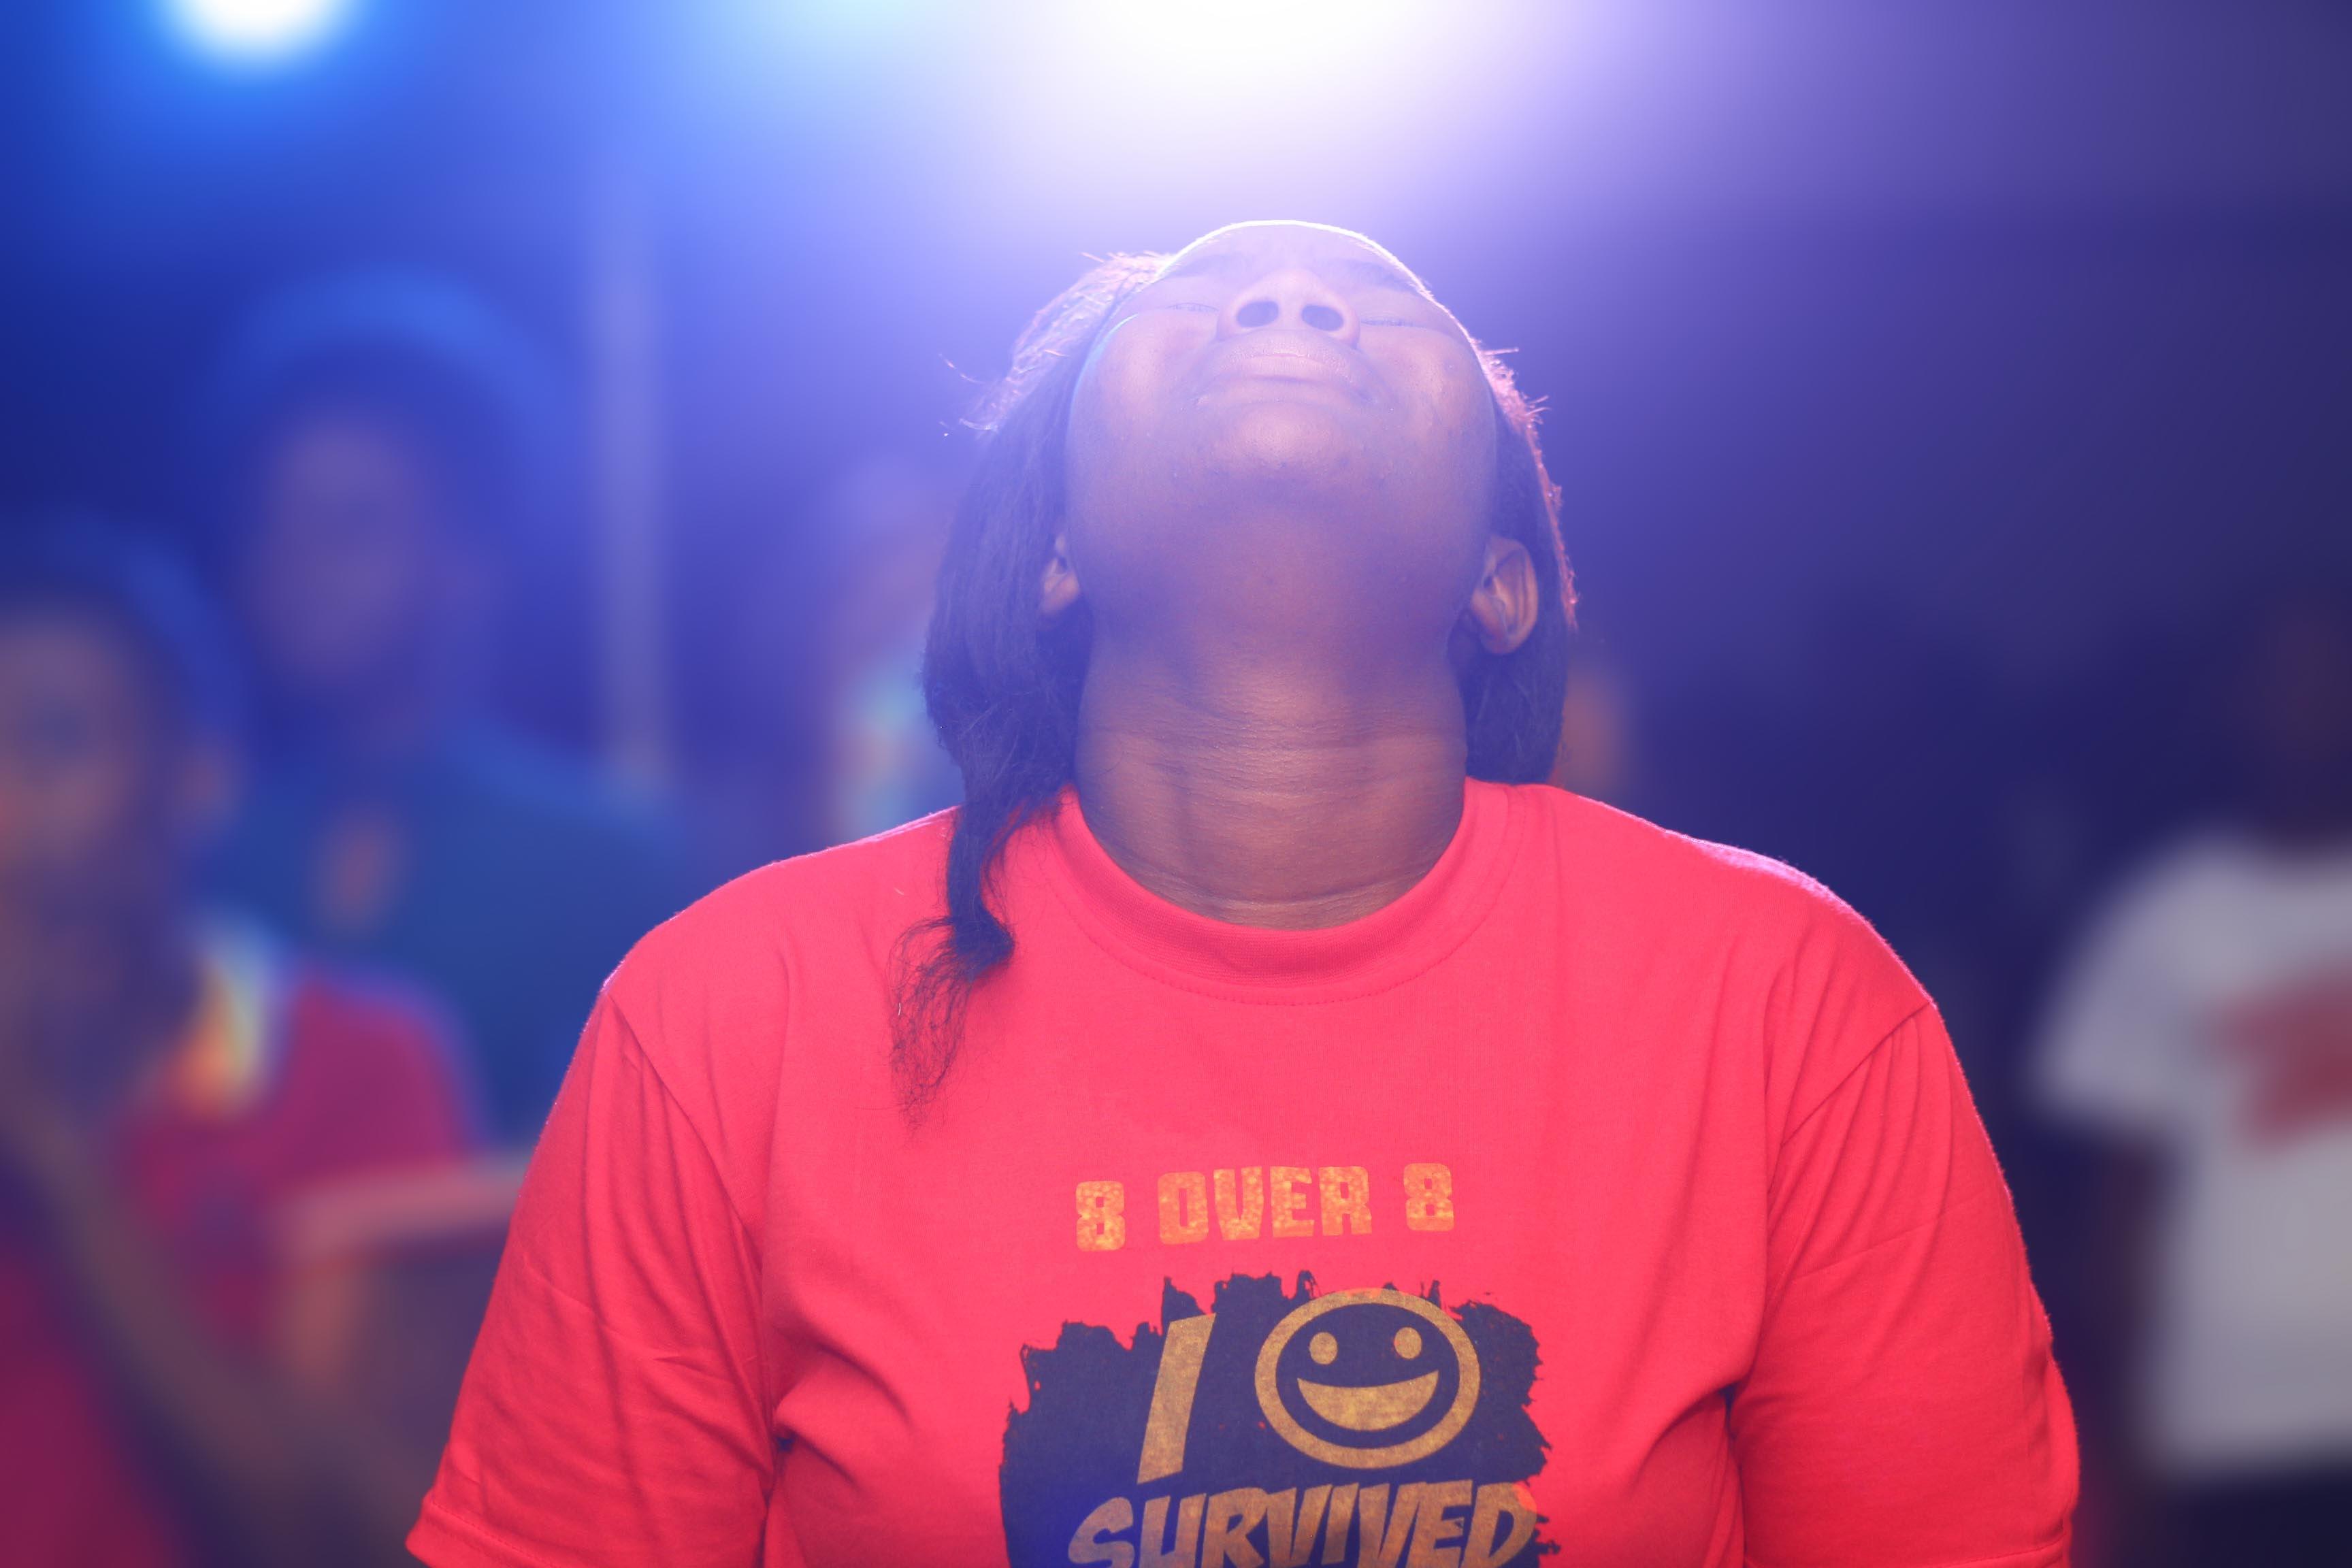 woman wearing crew-neck t-shirt facing upward while closing her eyes